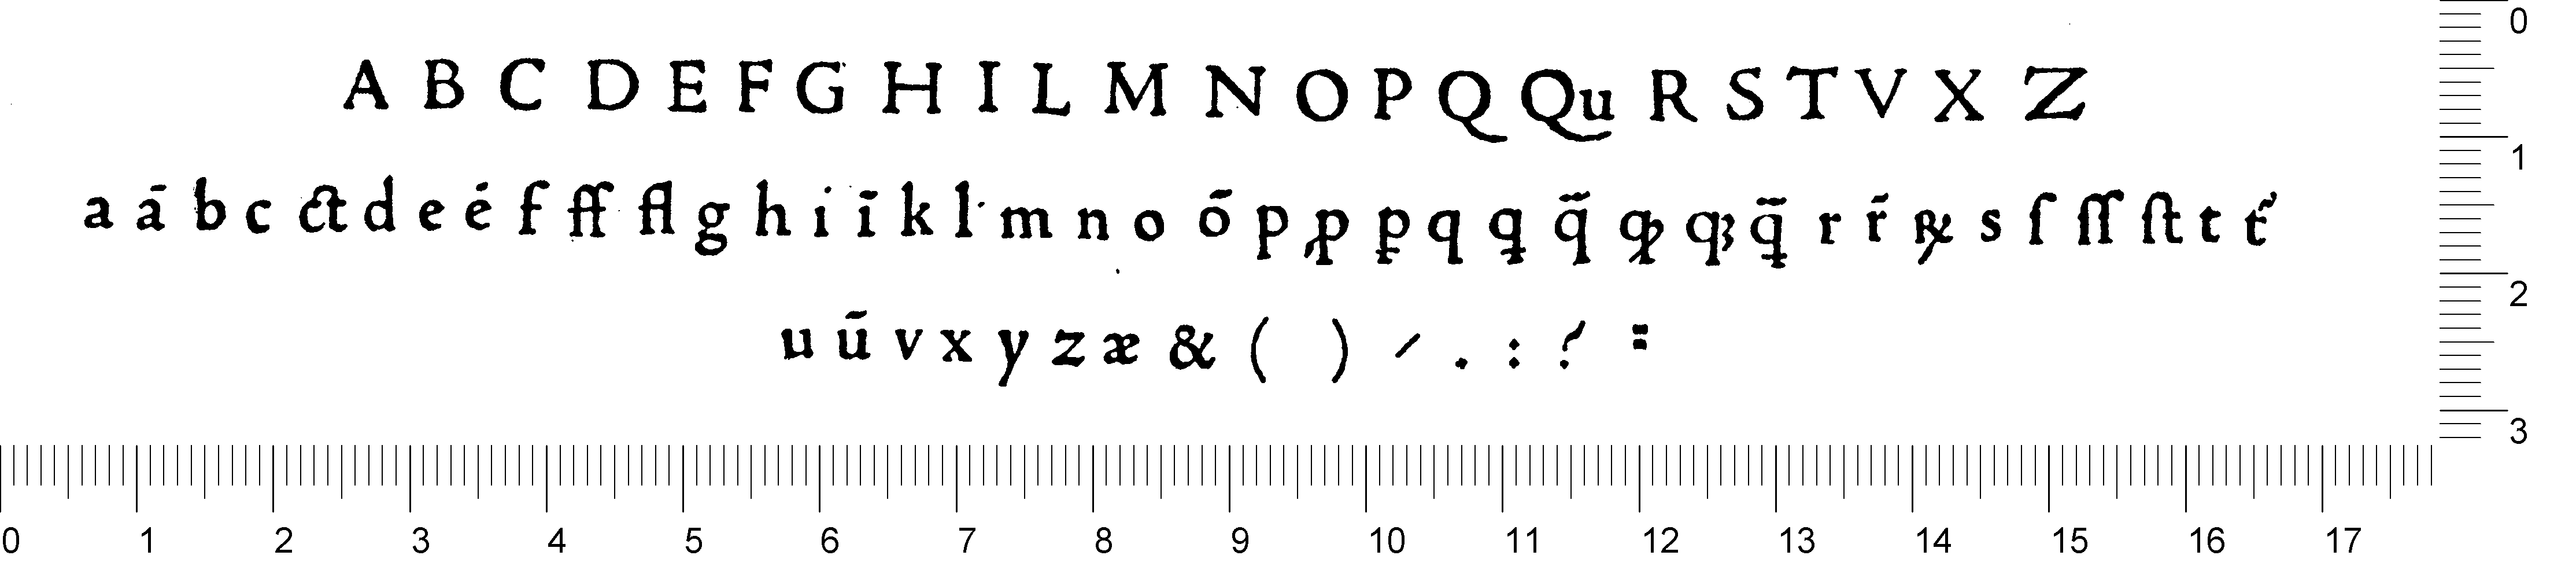 jenson-type-1-115R-GfT0551.1